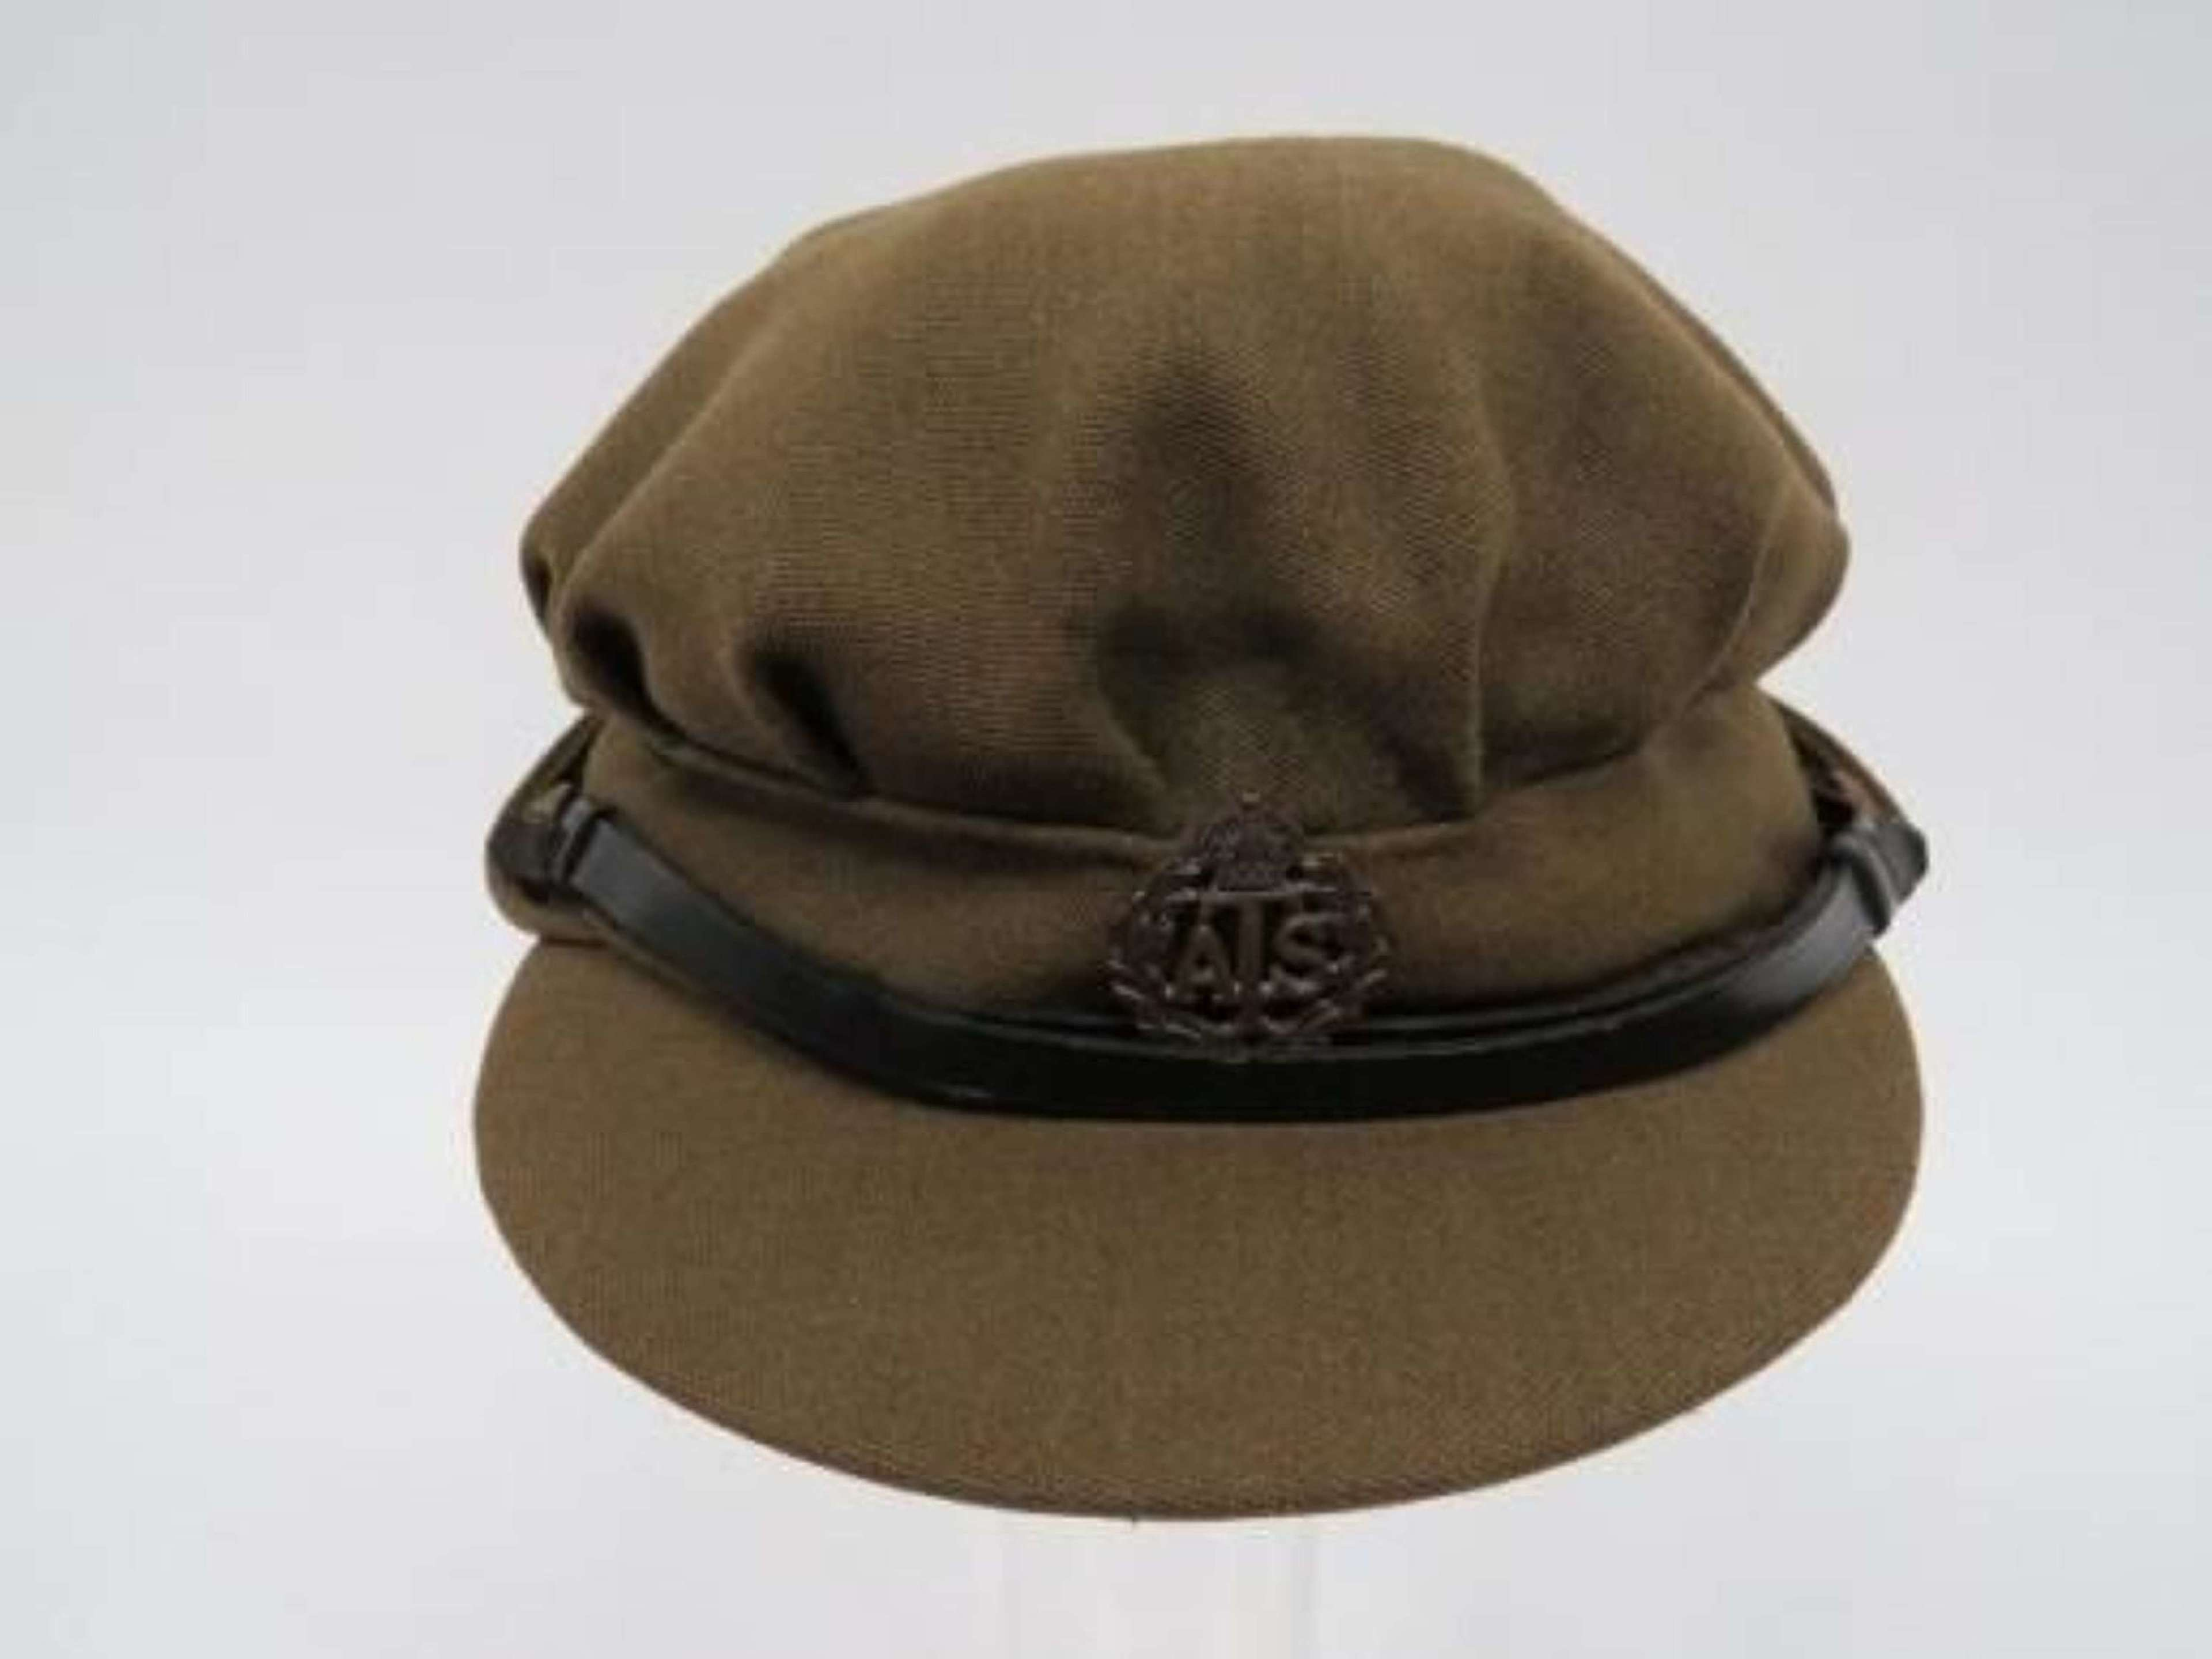 WW2 A.T.S Officers Service Dress Cap